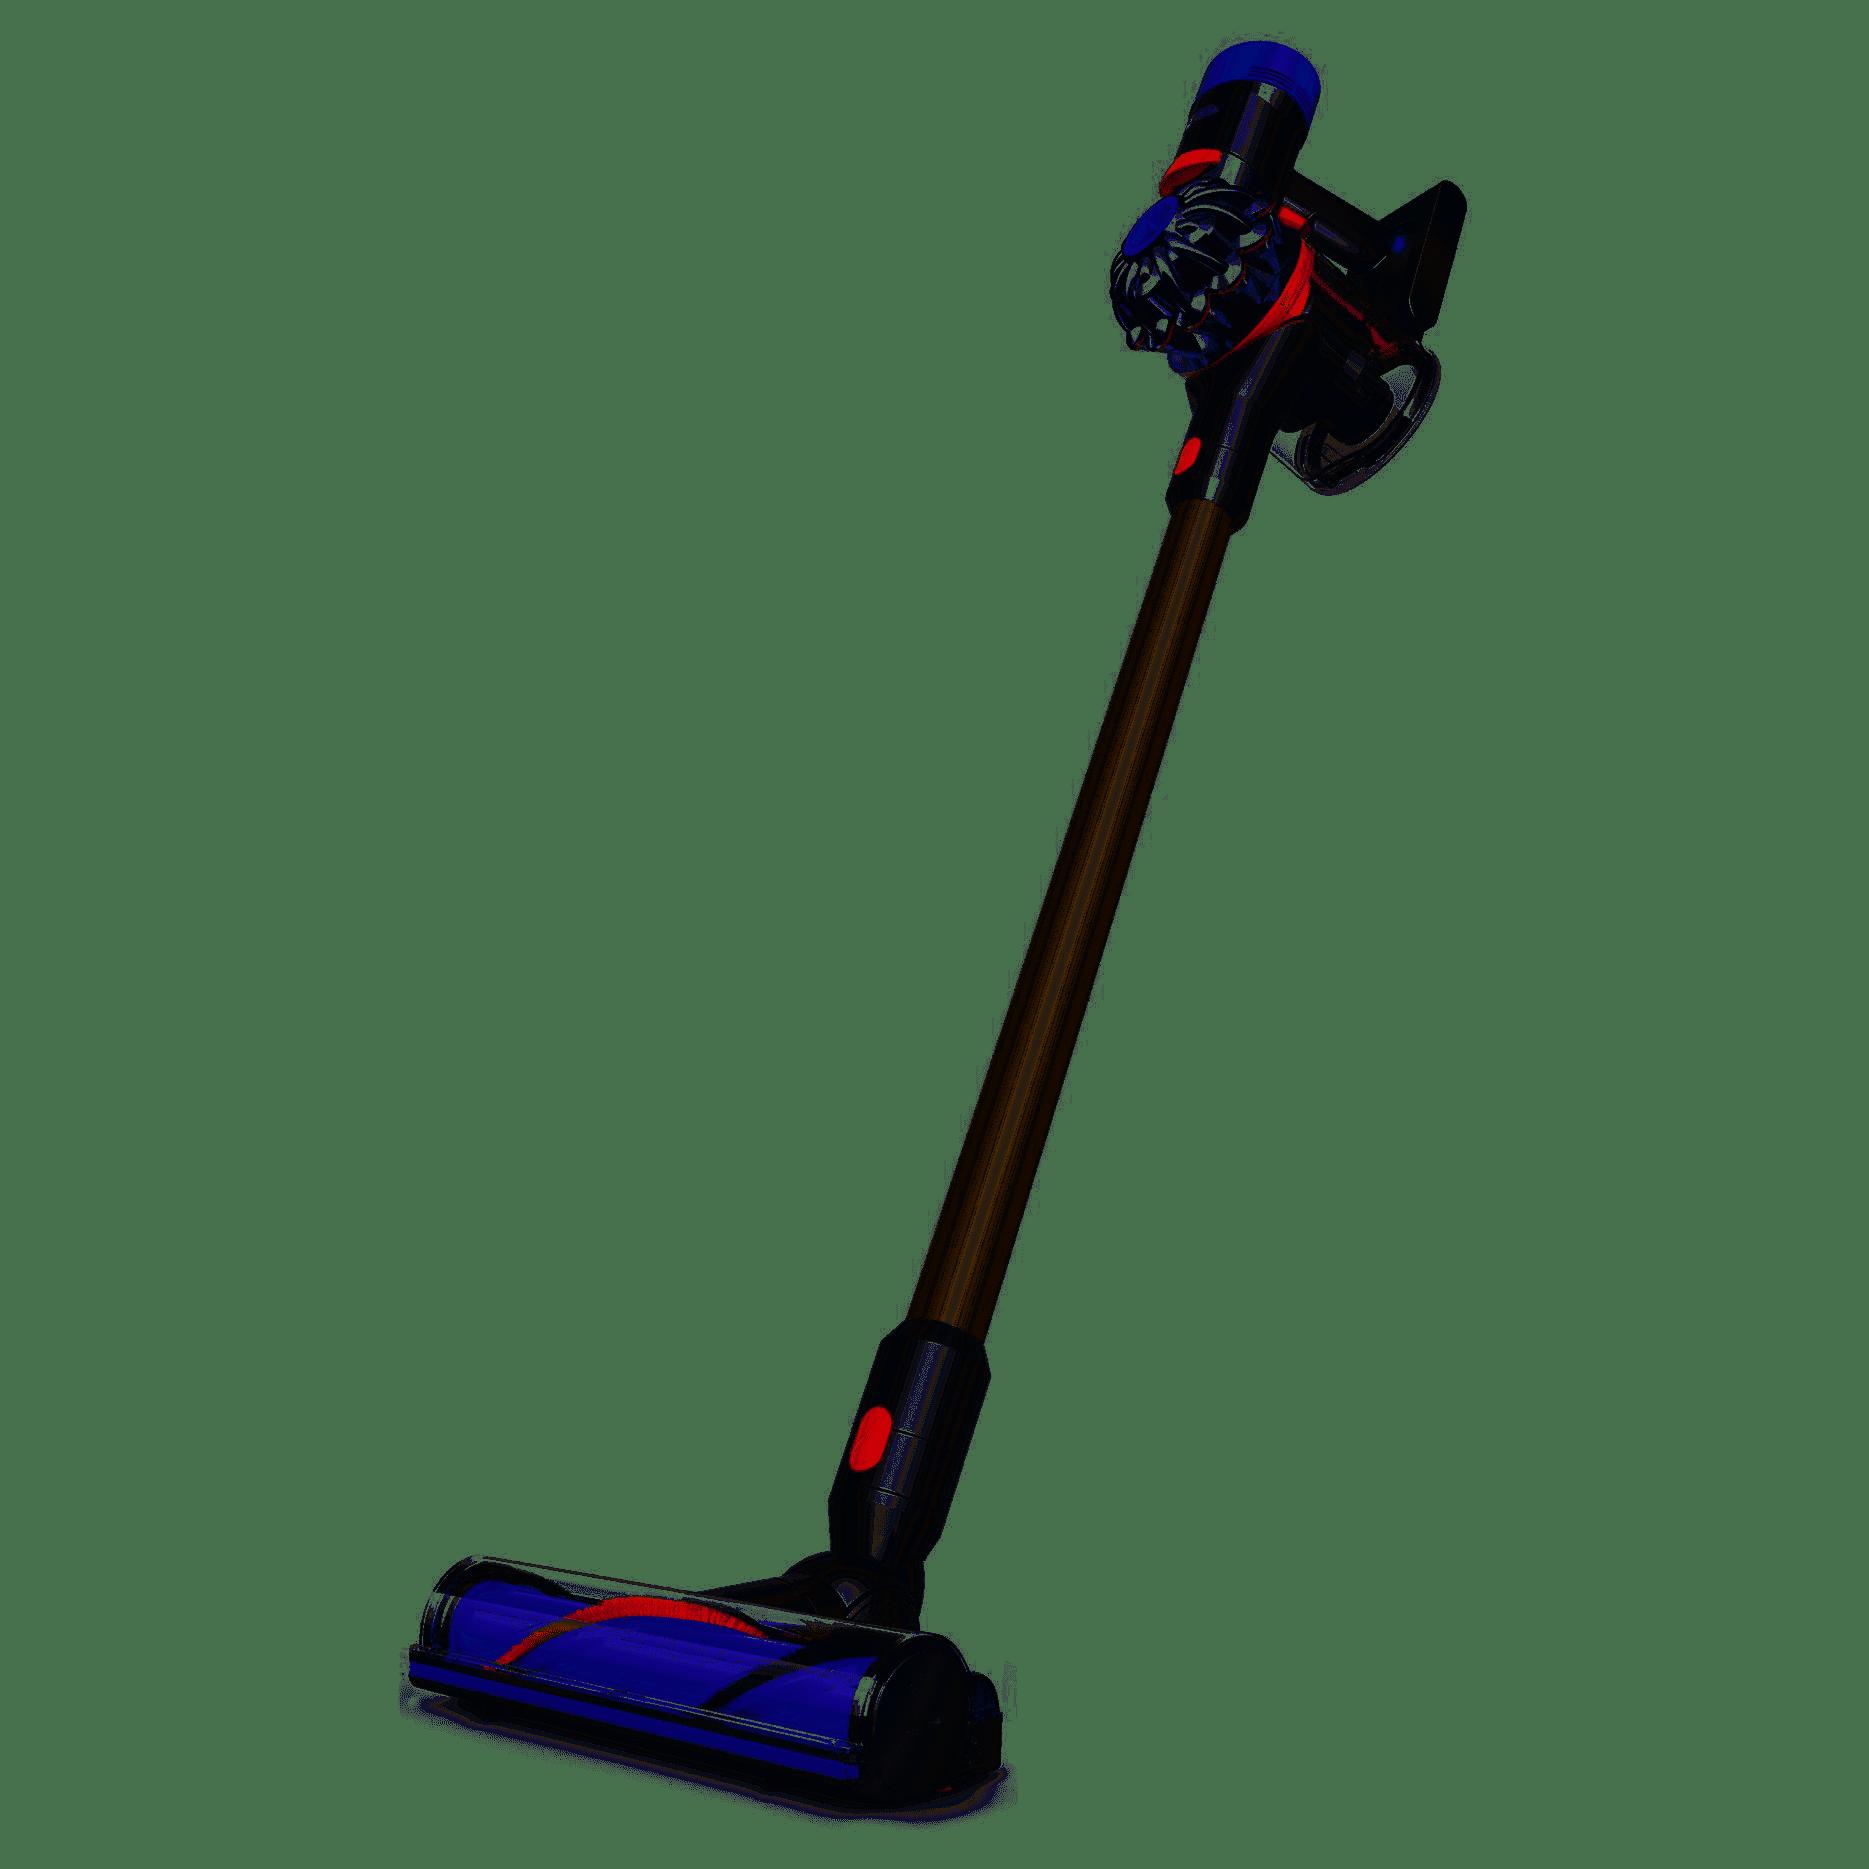 Dyson V8 Animal vacuum cleaner + Choice of Free Tool Bundle $249.99